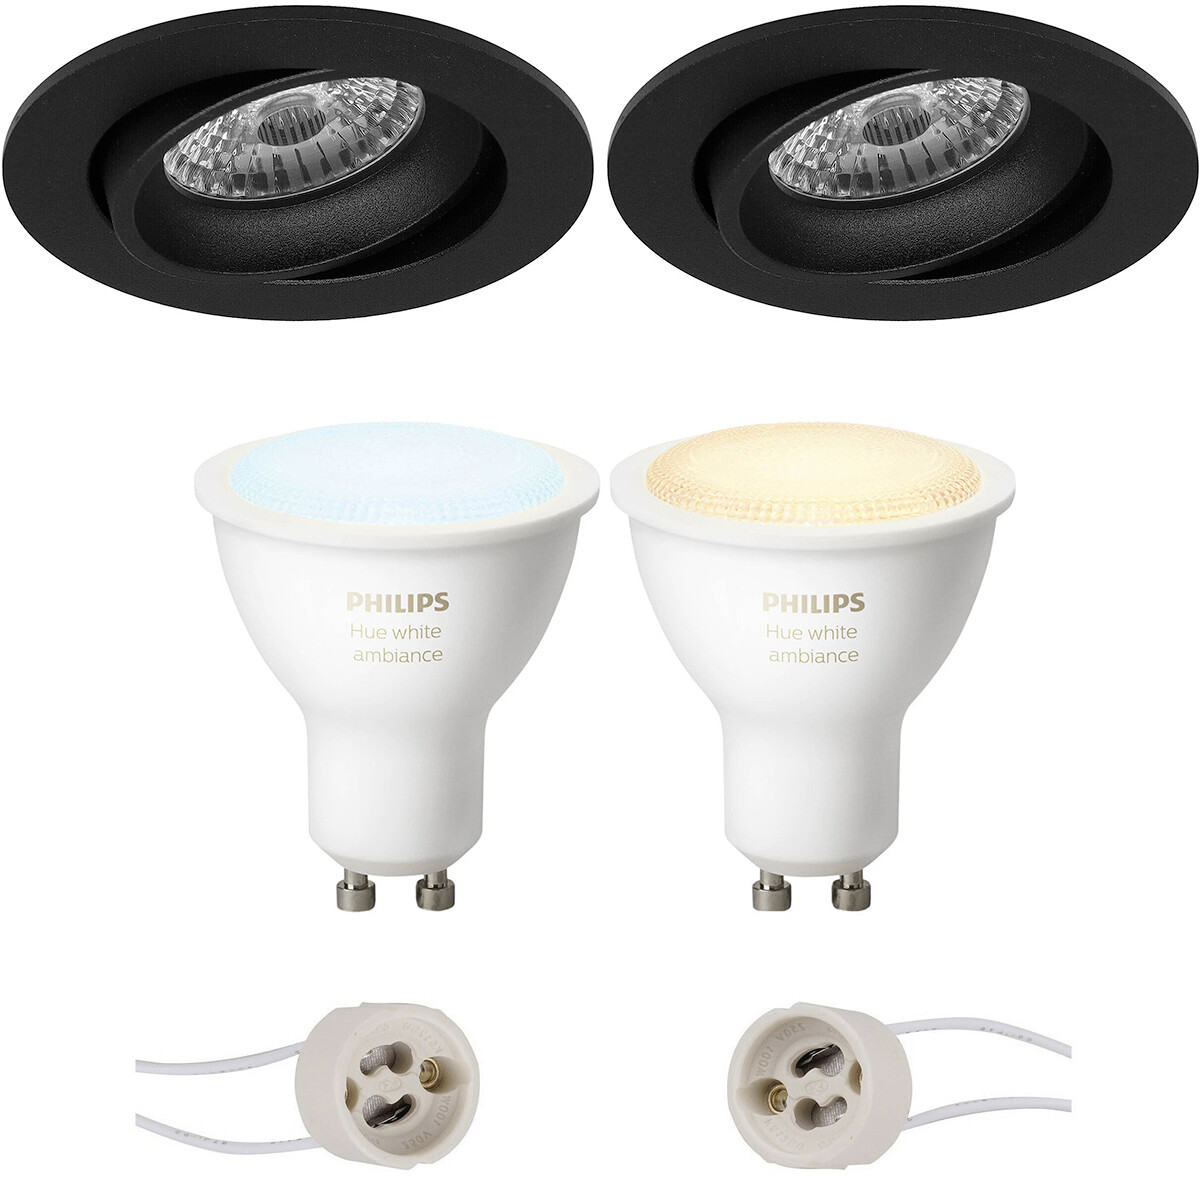 Pragmi Delton Pro - Inbouw Rond - Mat Zwart - Kantelbaar - Ø82mm - Philips Hue - LED Spot Set GU10 -